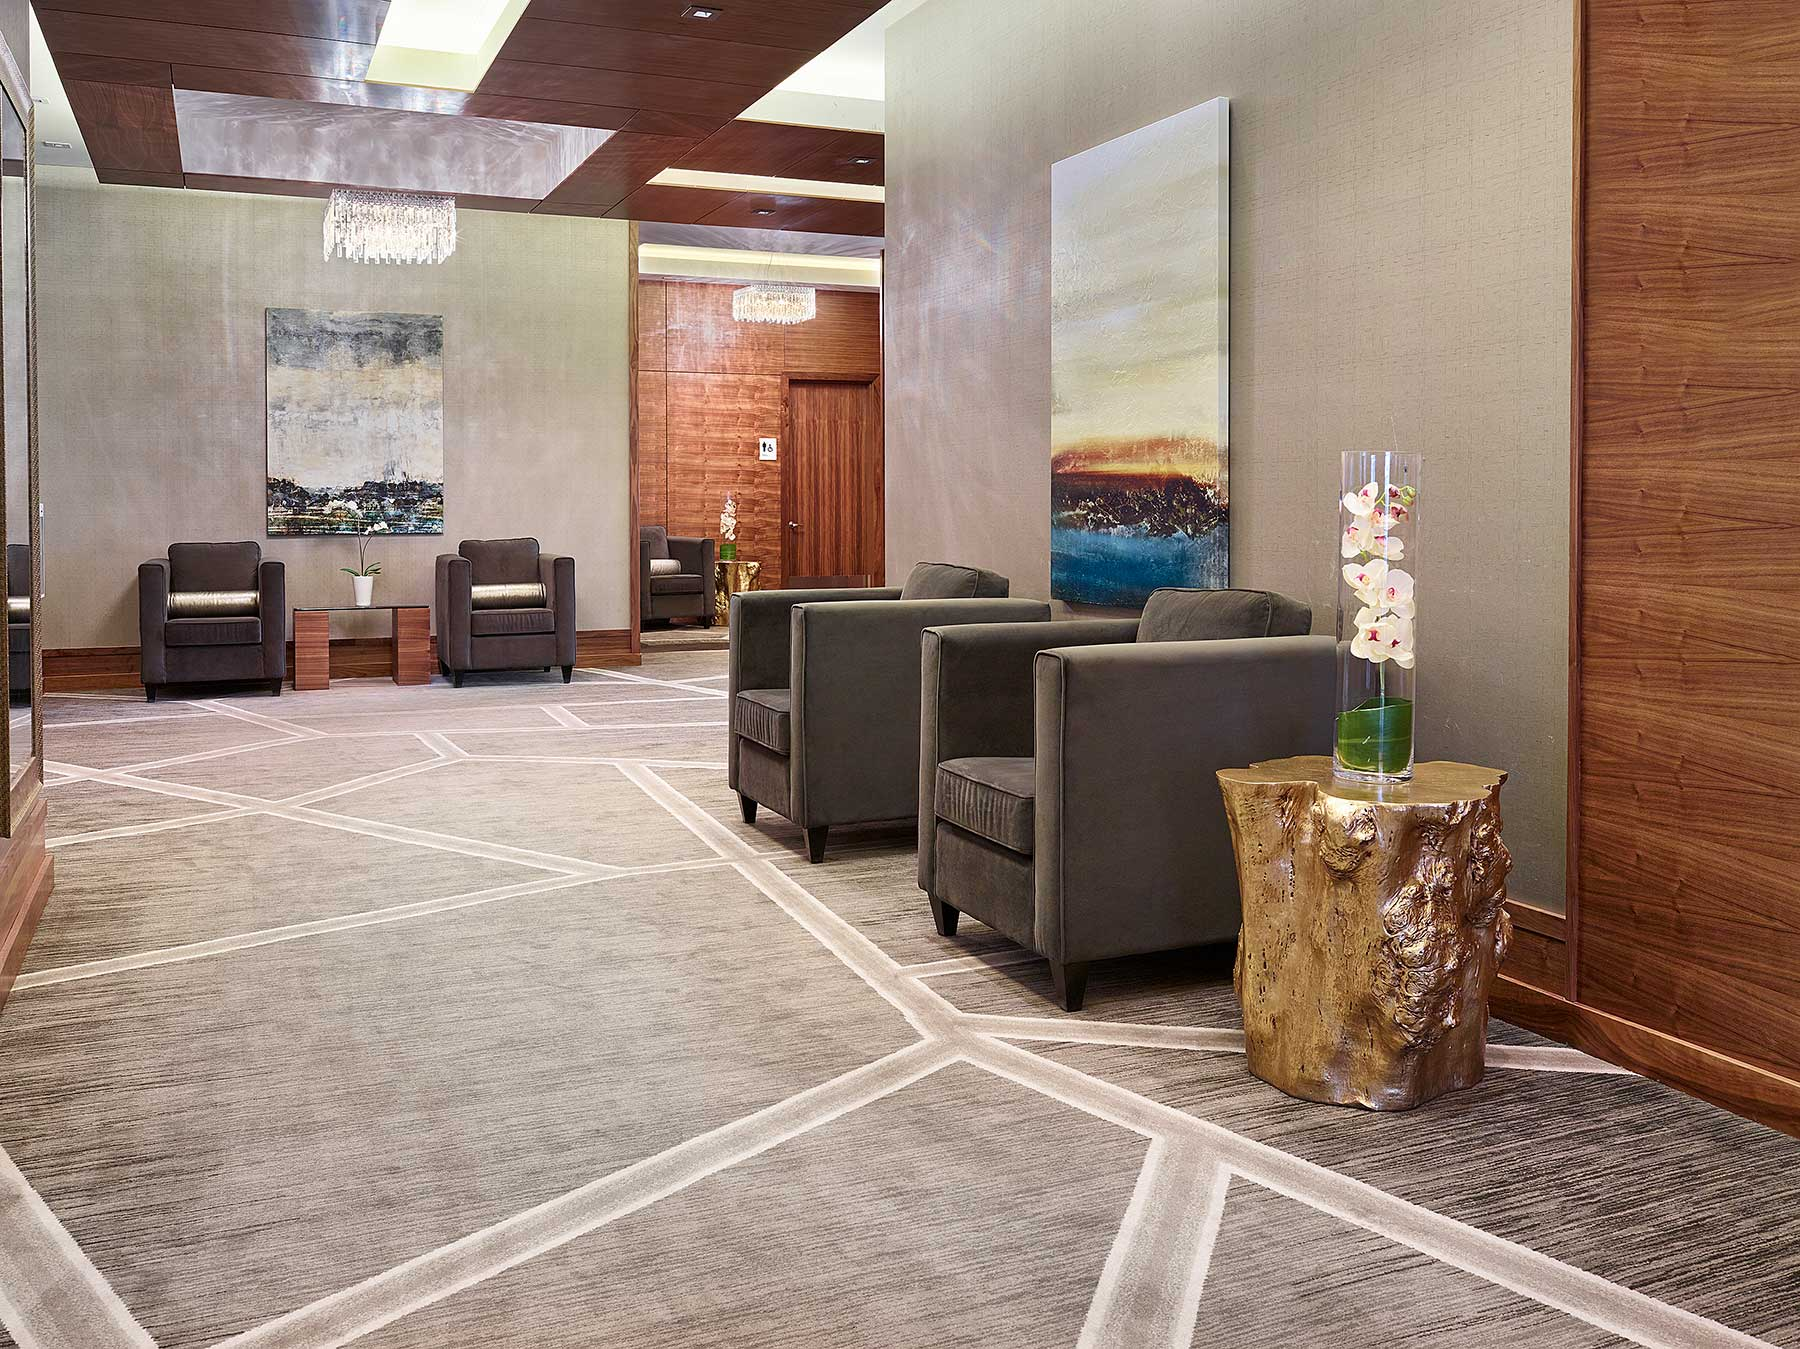 Radisson Hotel Conference Center project 5, hotel interior design Edmonton